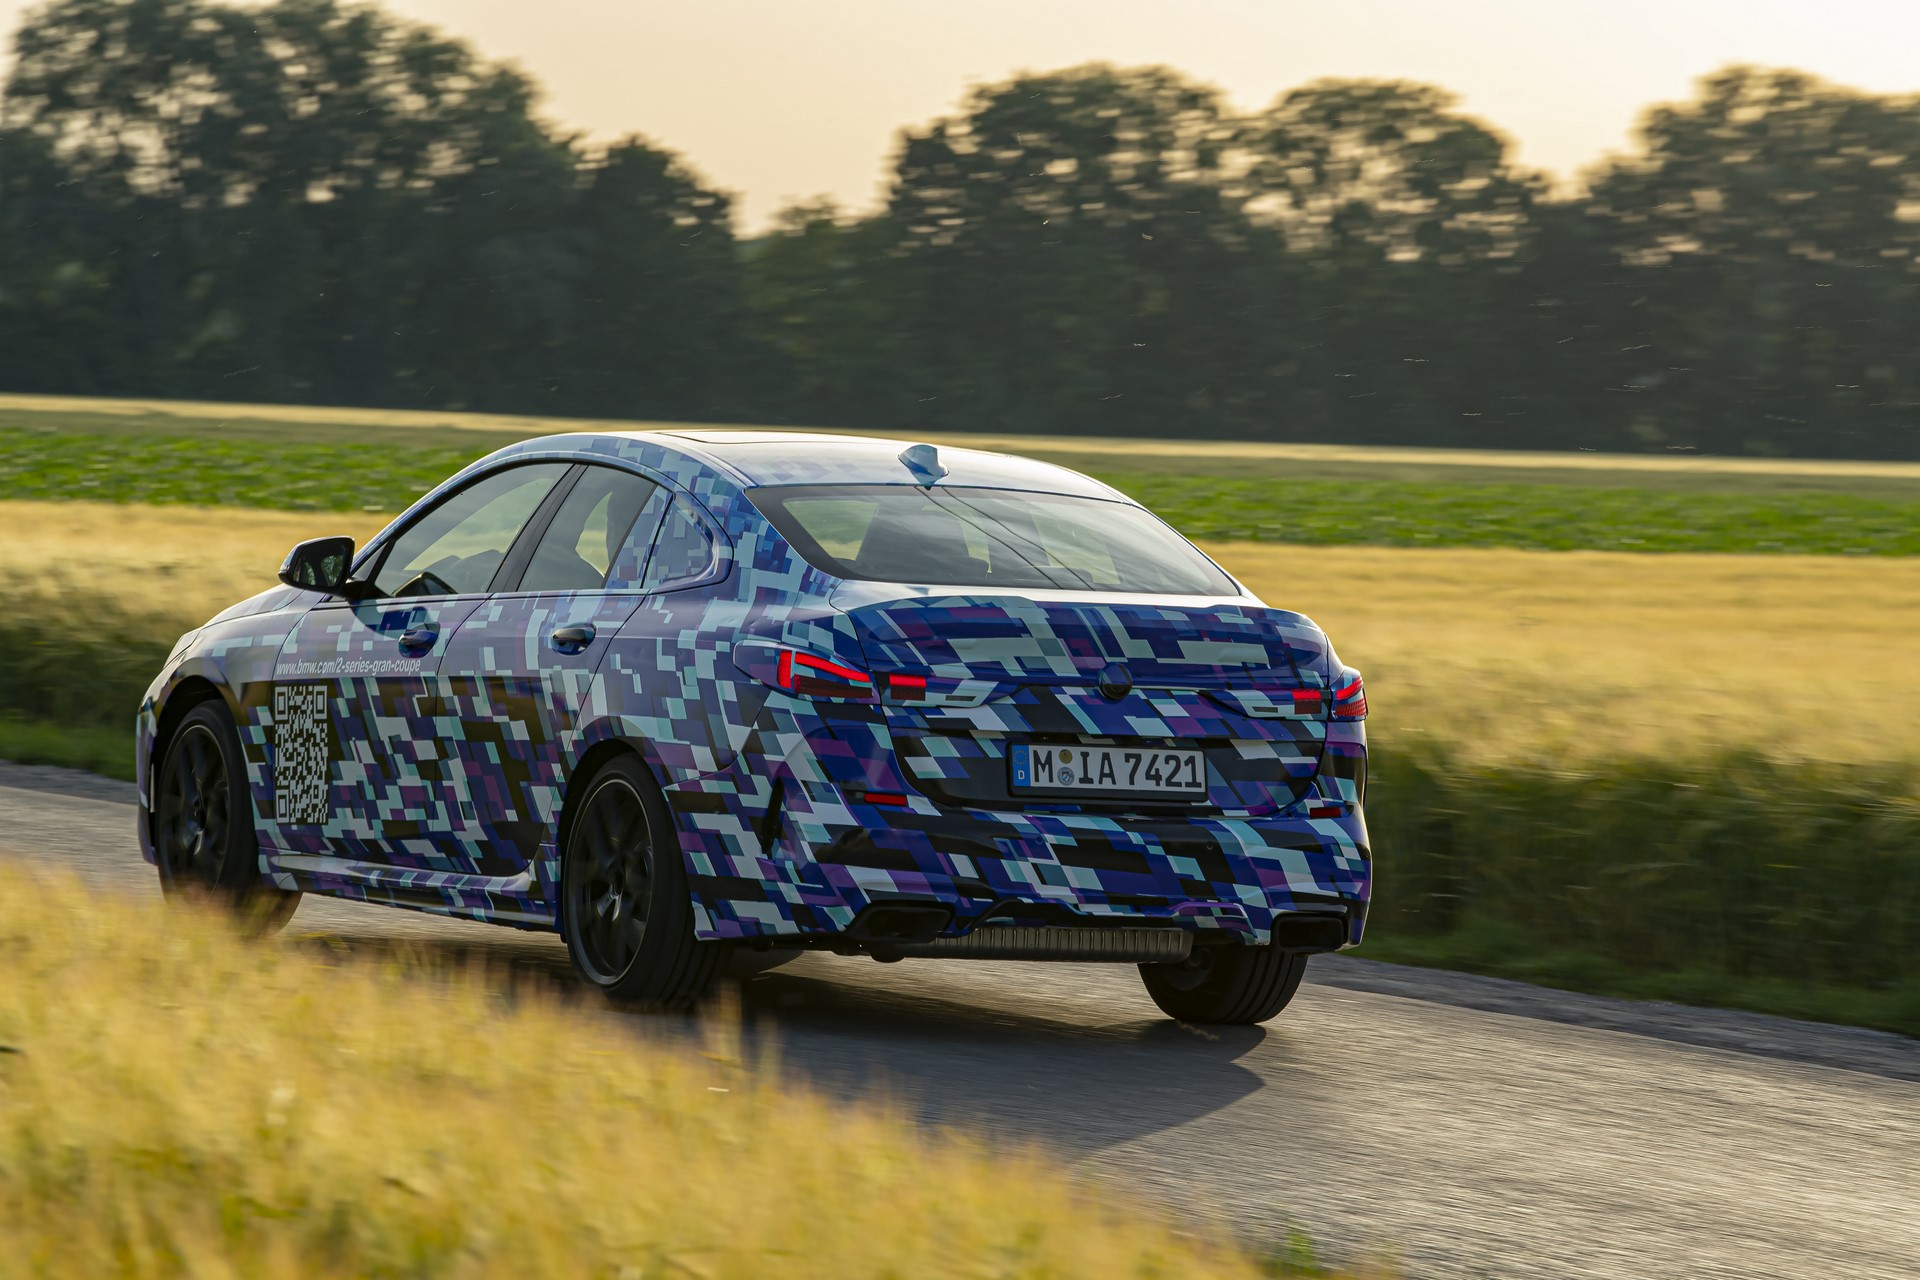 BMW-2-Series-Gran-Coupe-2020-spy-photos-15